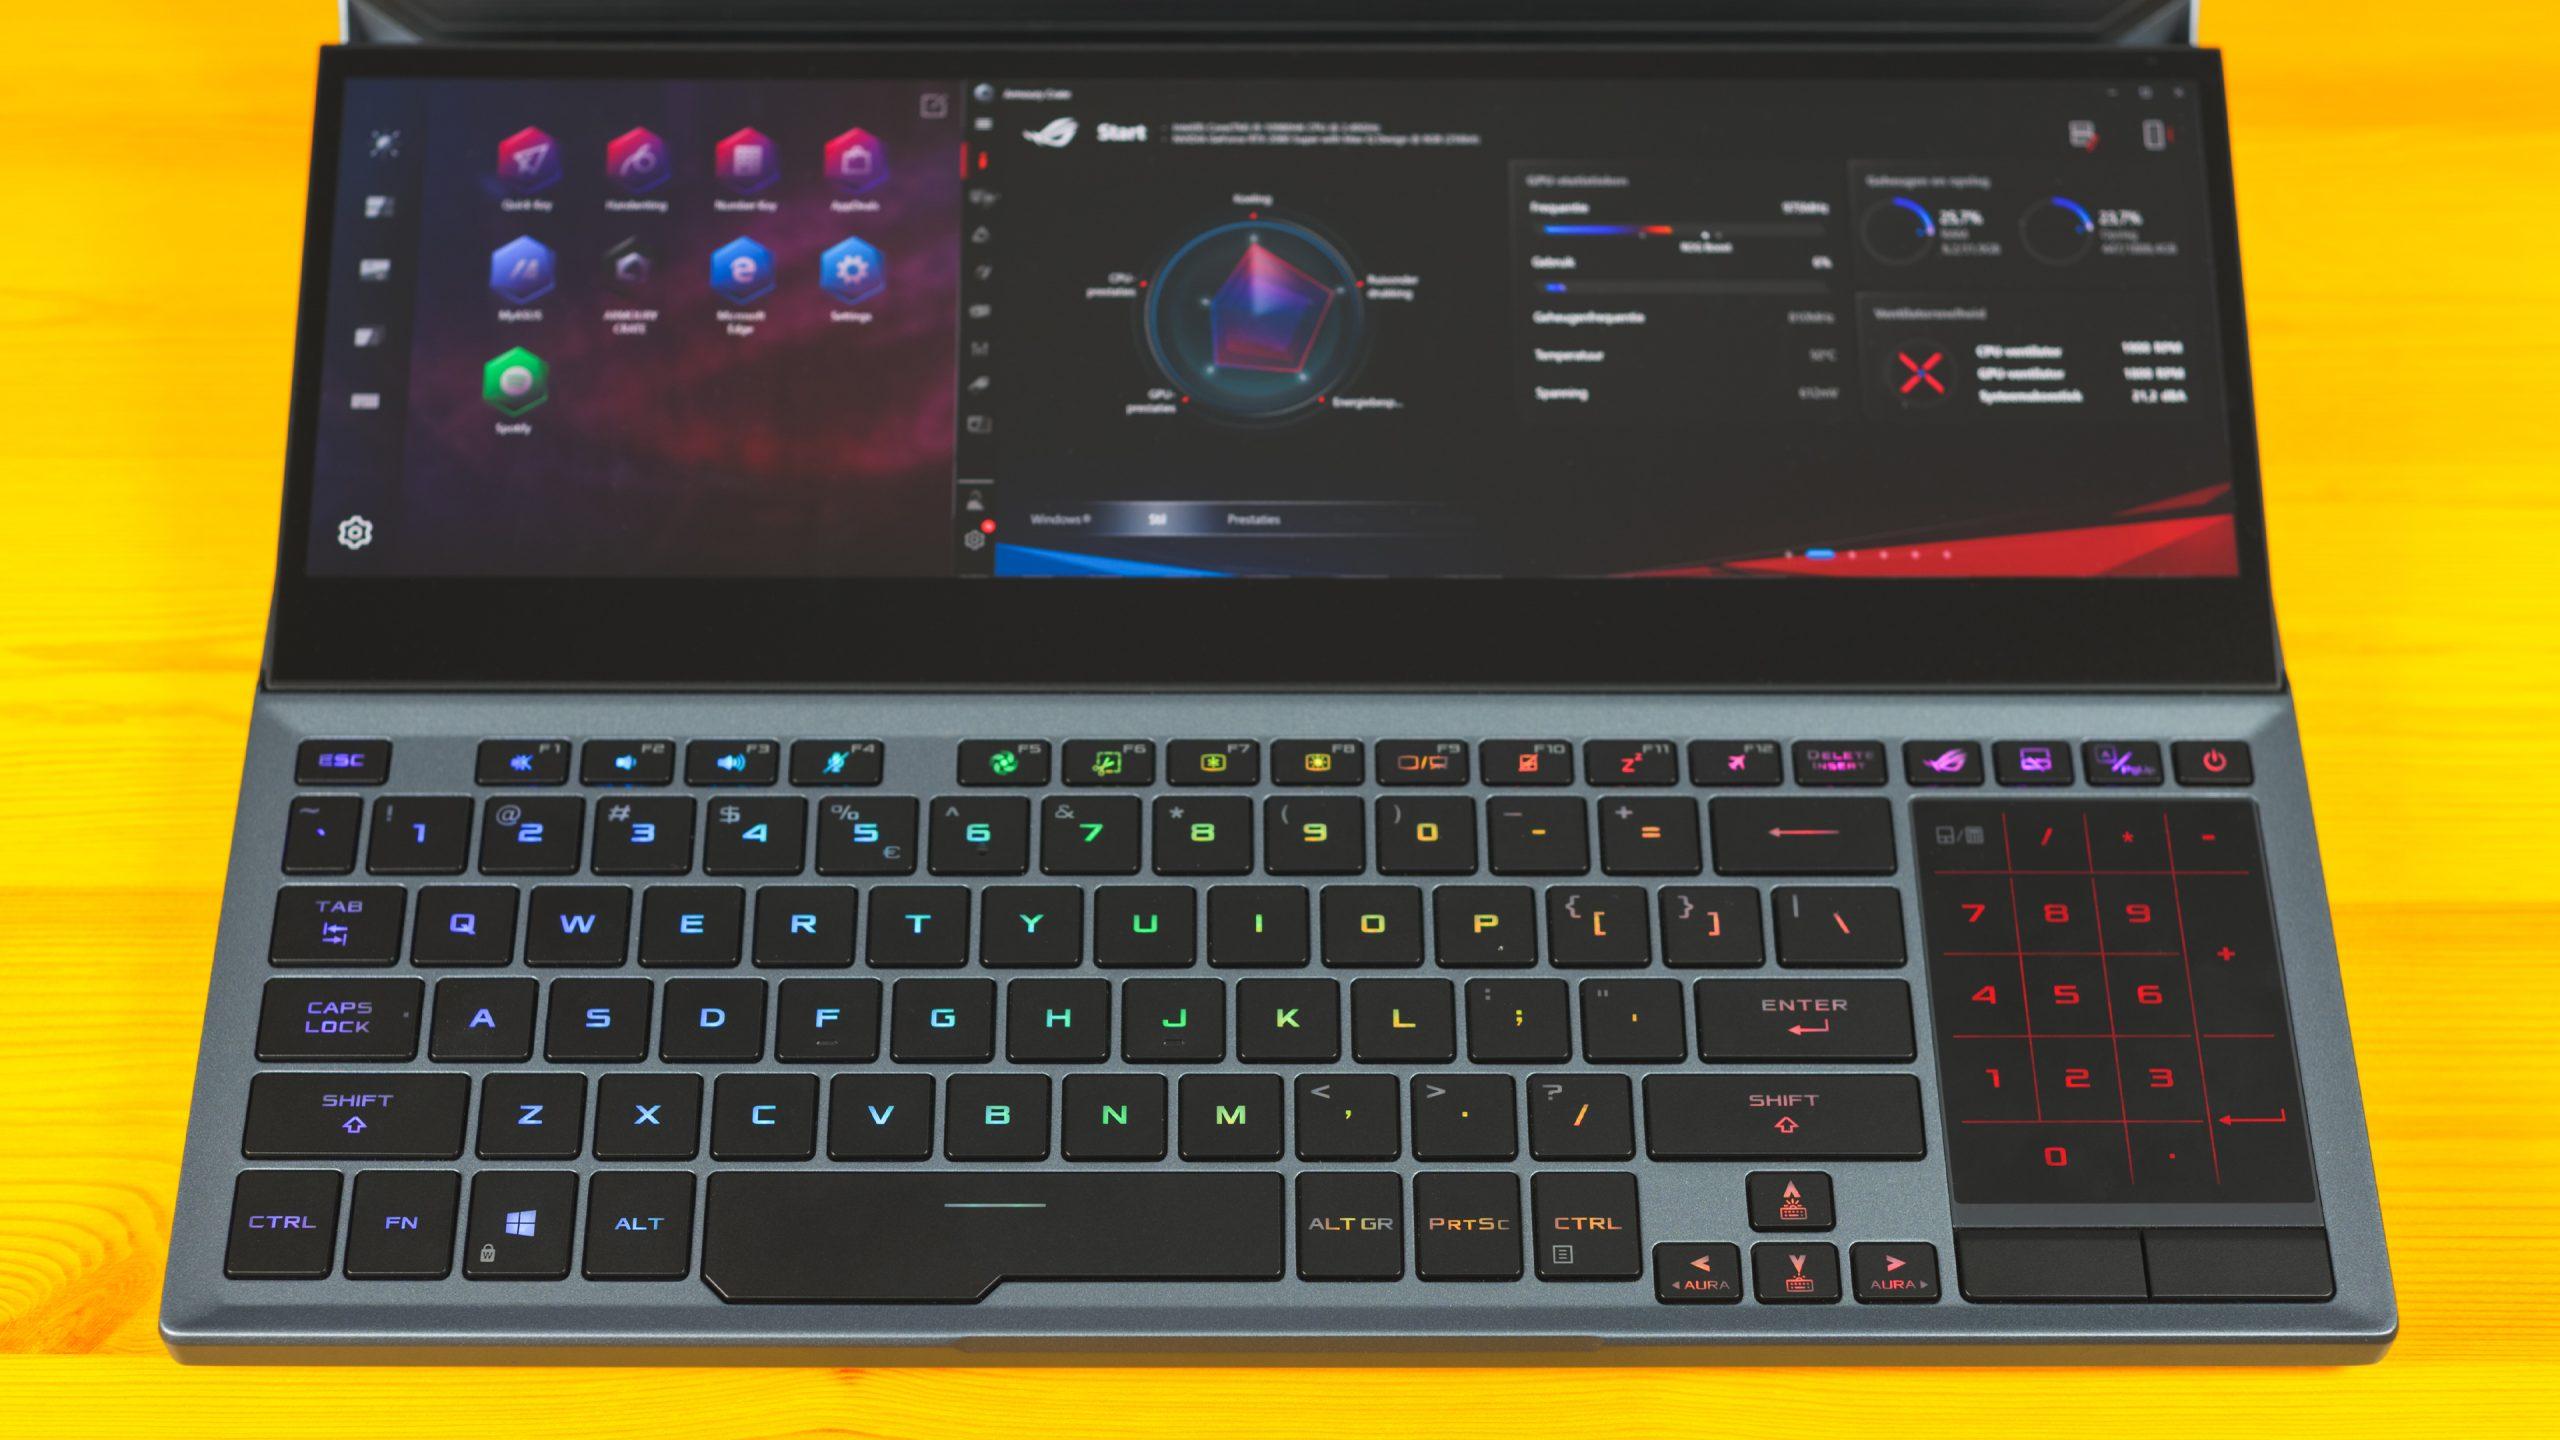 Foto van het onderpaneel van de ASUS ROG Zephyrus Duo 15, met daarop het toetsenbord en het tweede ROG ScreenPad Plus tweede touch-display.